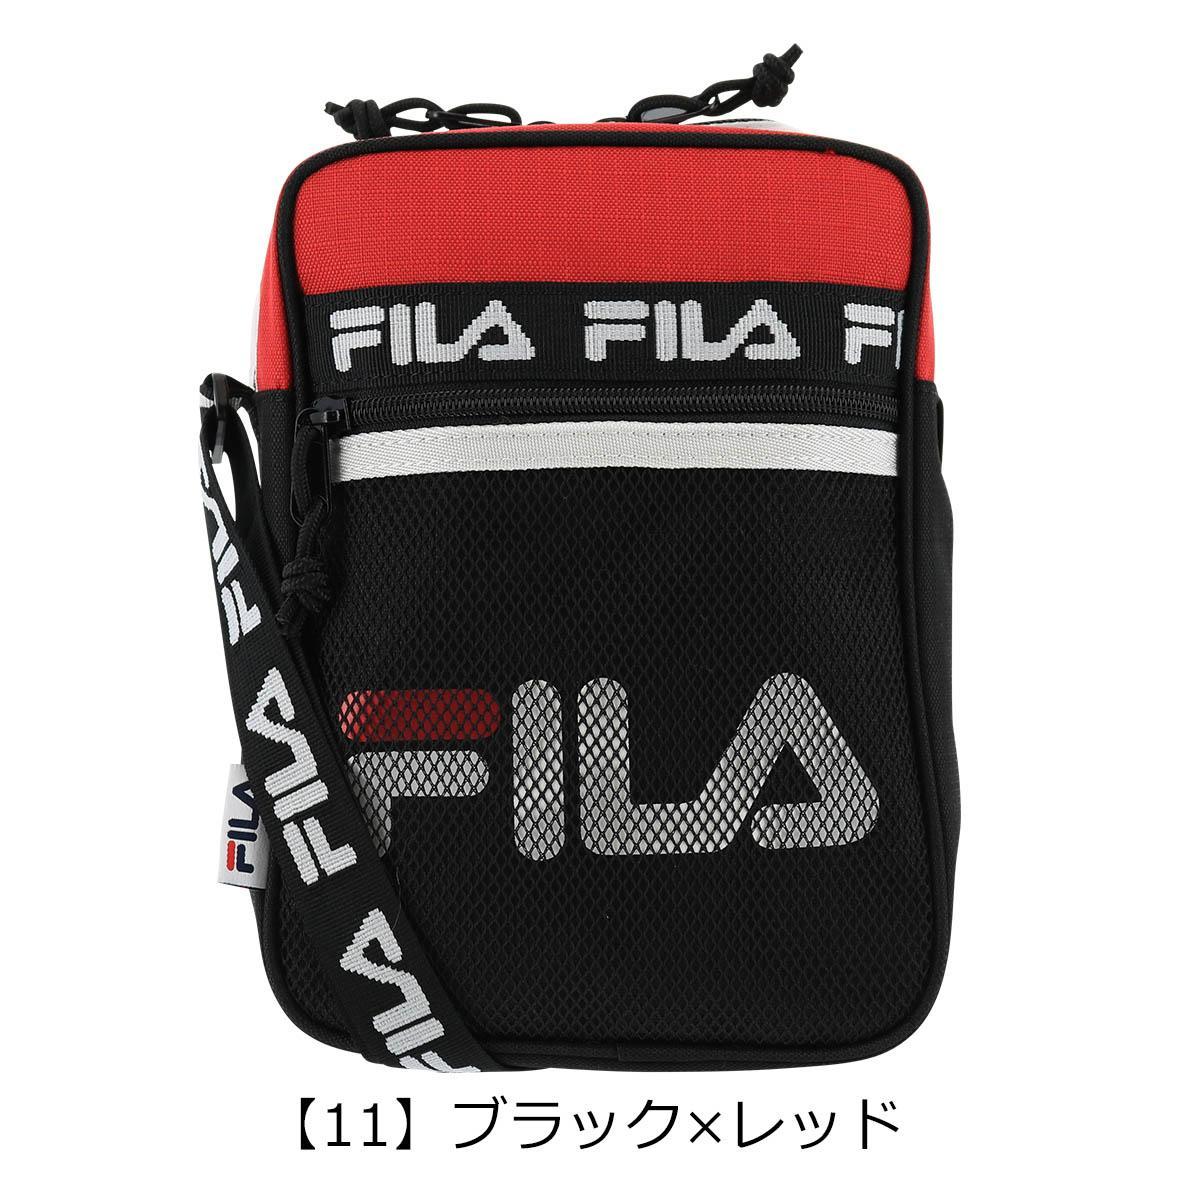 [FILA]  Sports Mini Cross Body Shoulder Bag